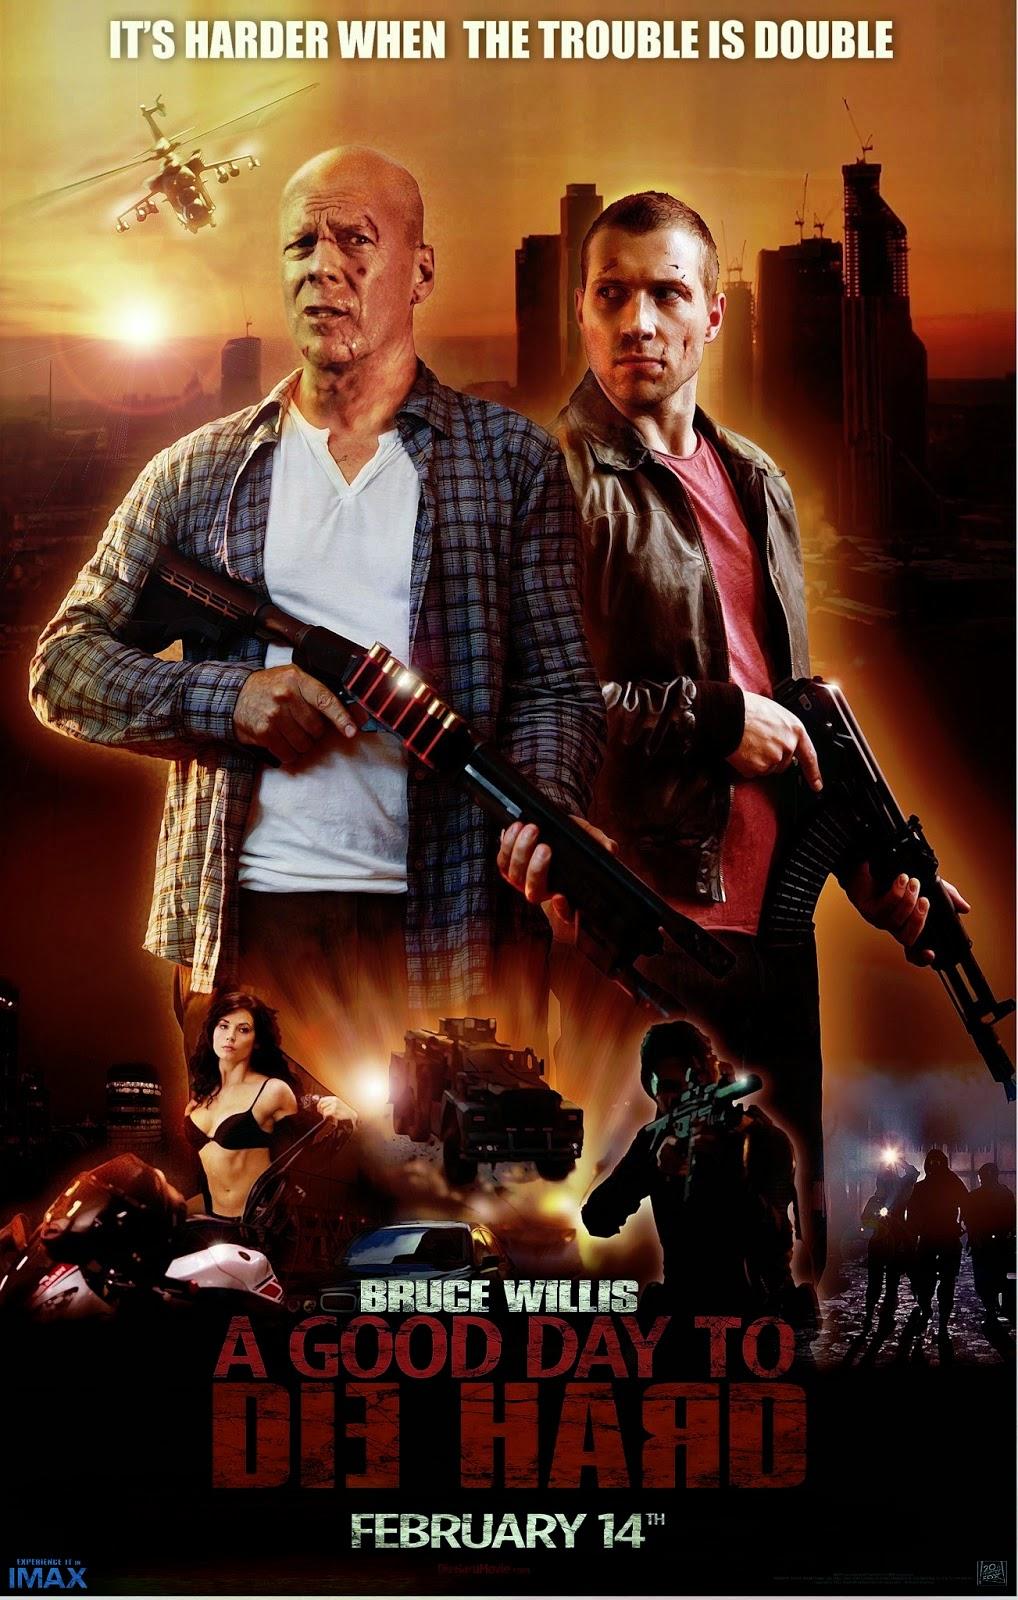 Die Hard 5 วันดีมหาวินาศ คนอึดตายยาก [HD][พากย์ไทย]